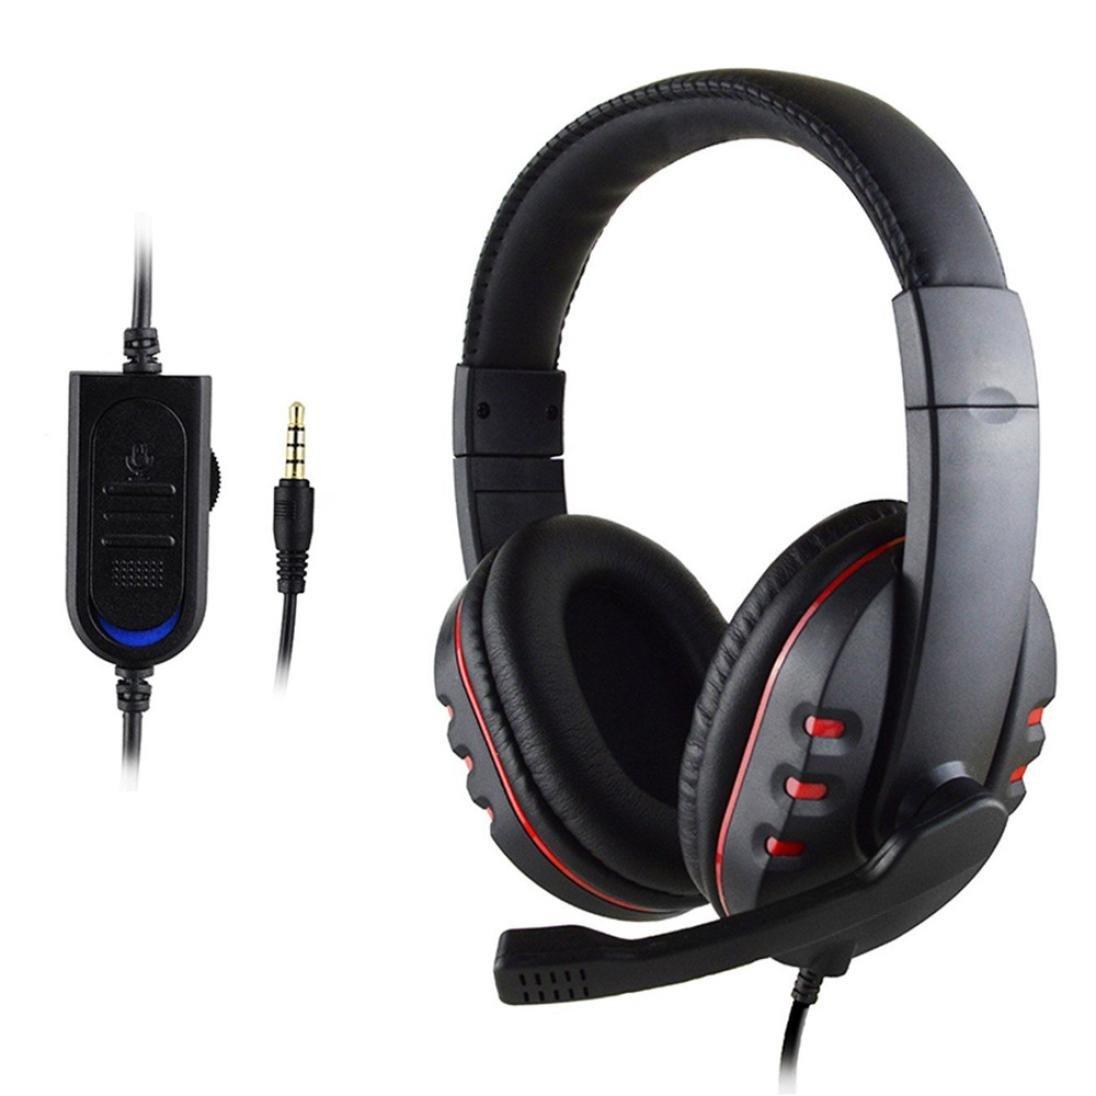 Spielkopfhö rer, HARRYSTORE Gaming Headset Voice Control Verkabelt HI-FI Sound Qualitä t Kopfhö rer fü r PS4 TDRJ-5689